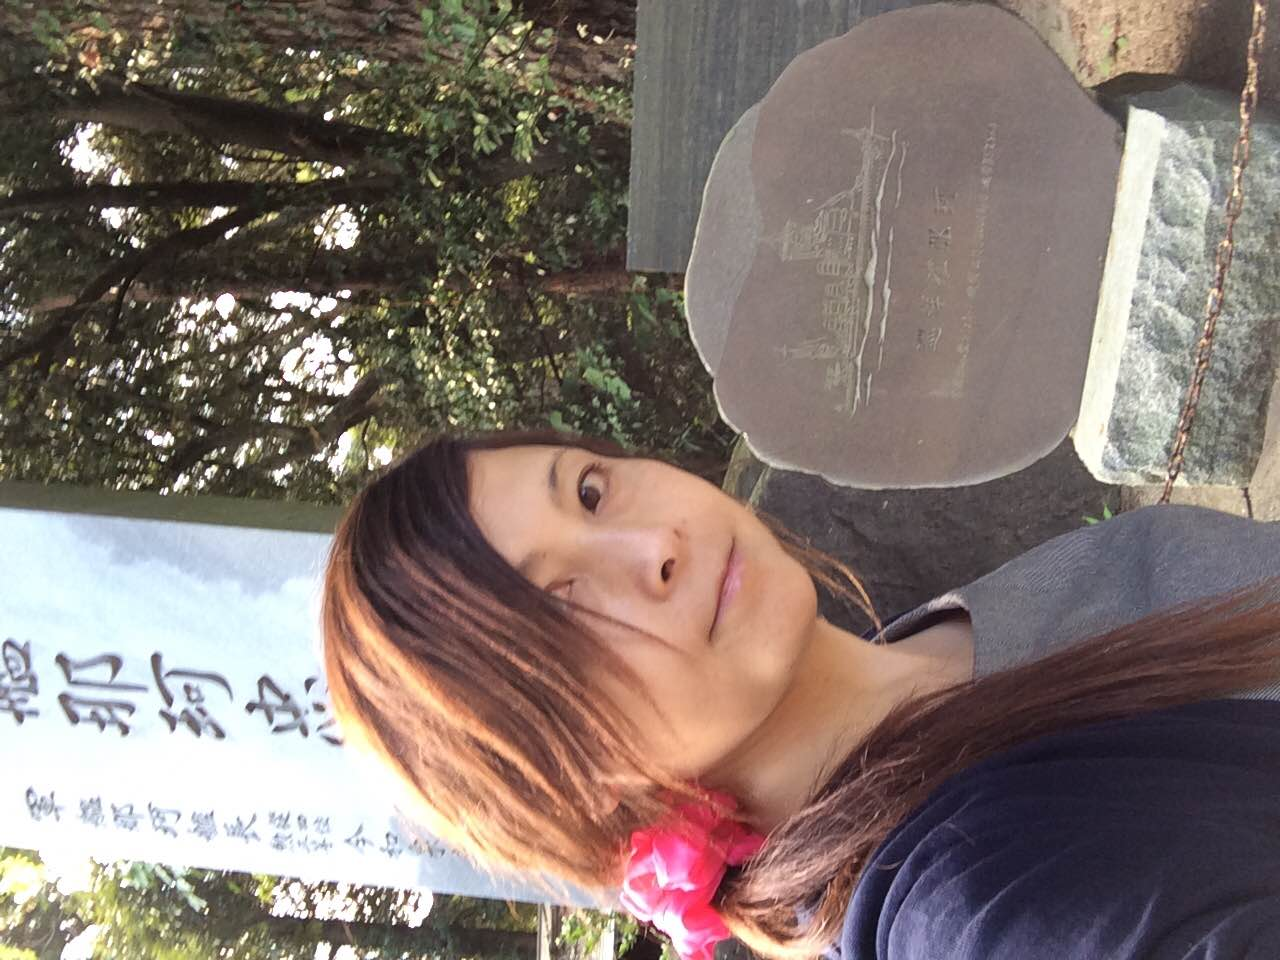 1/2014092215461813-IMG_1493-small.jpg